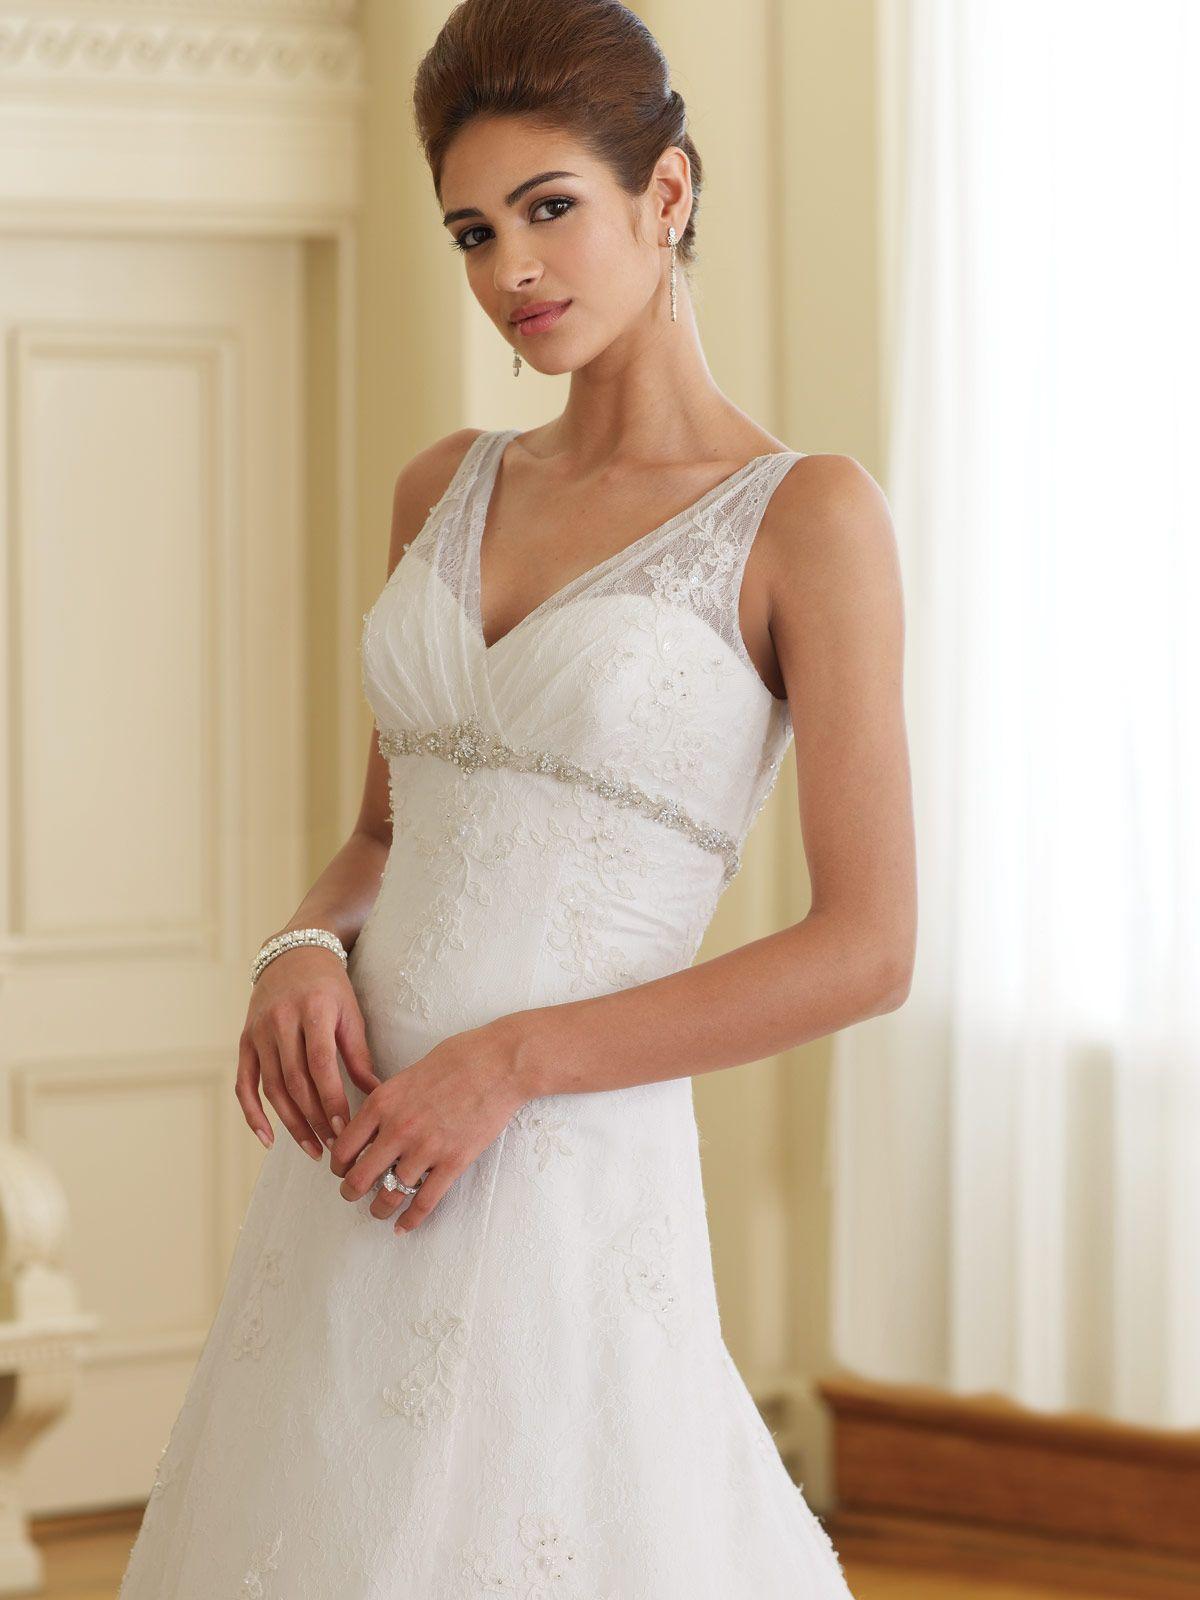 sundress wedding dress Wedding gowns for petite brides weddings paradise